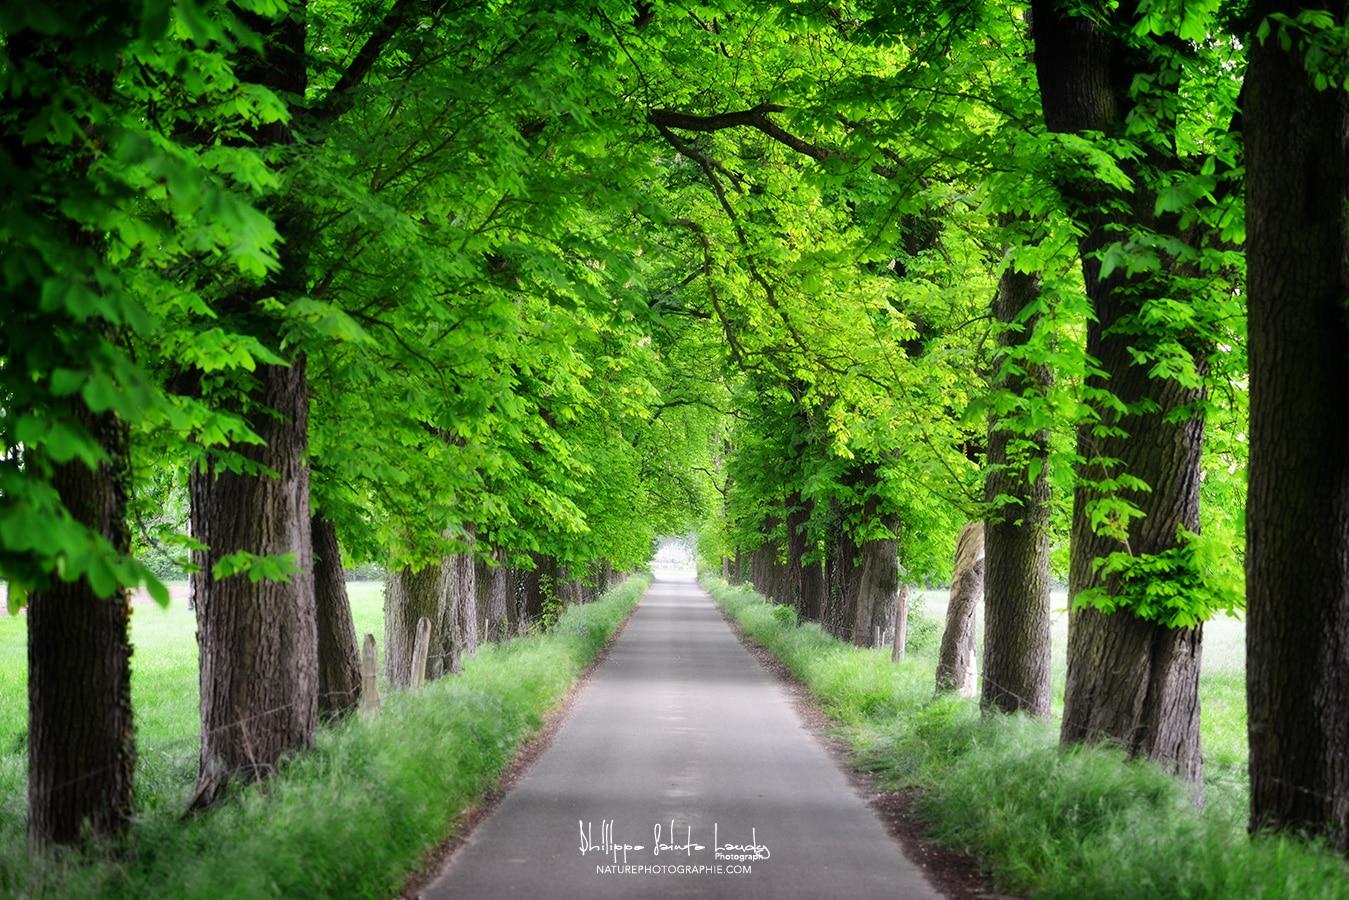 All e verte nature photographie for Entretien jardin printemps